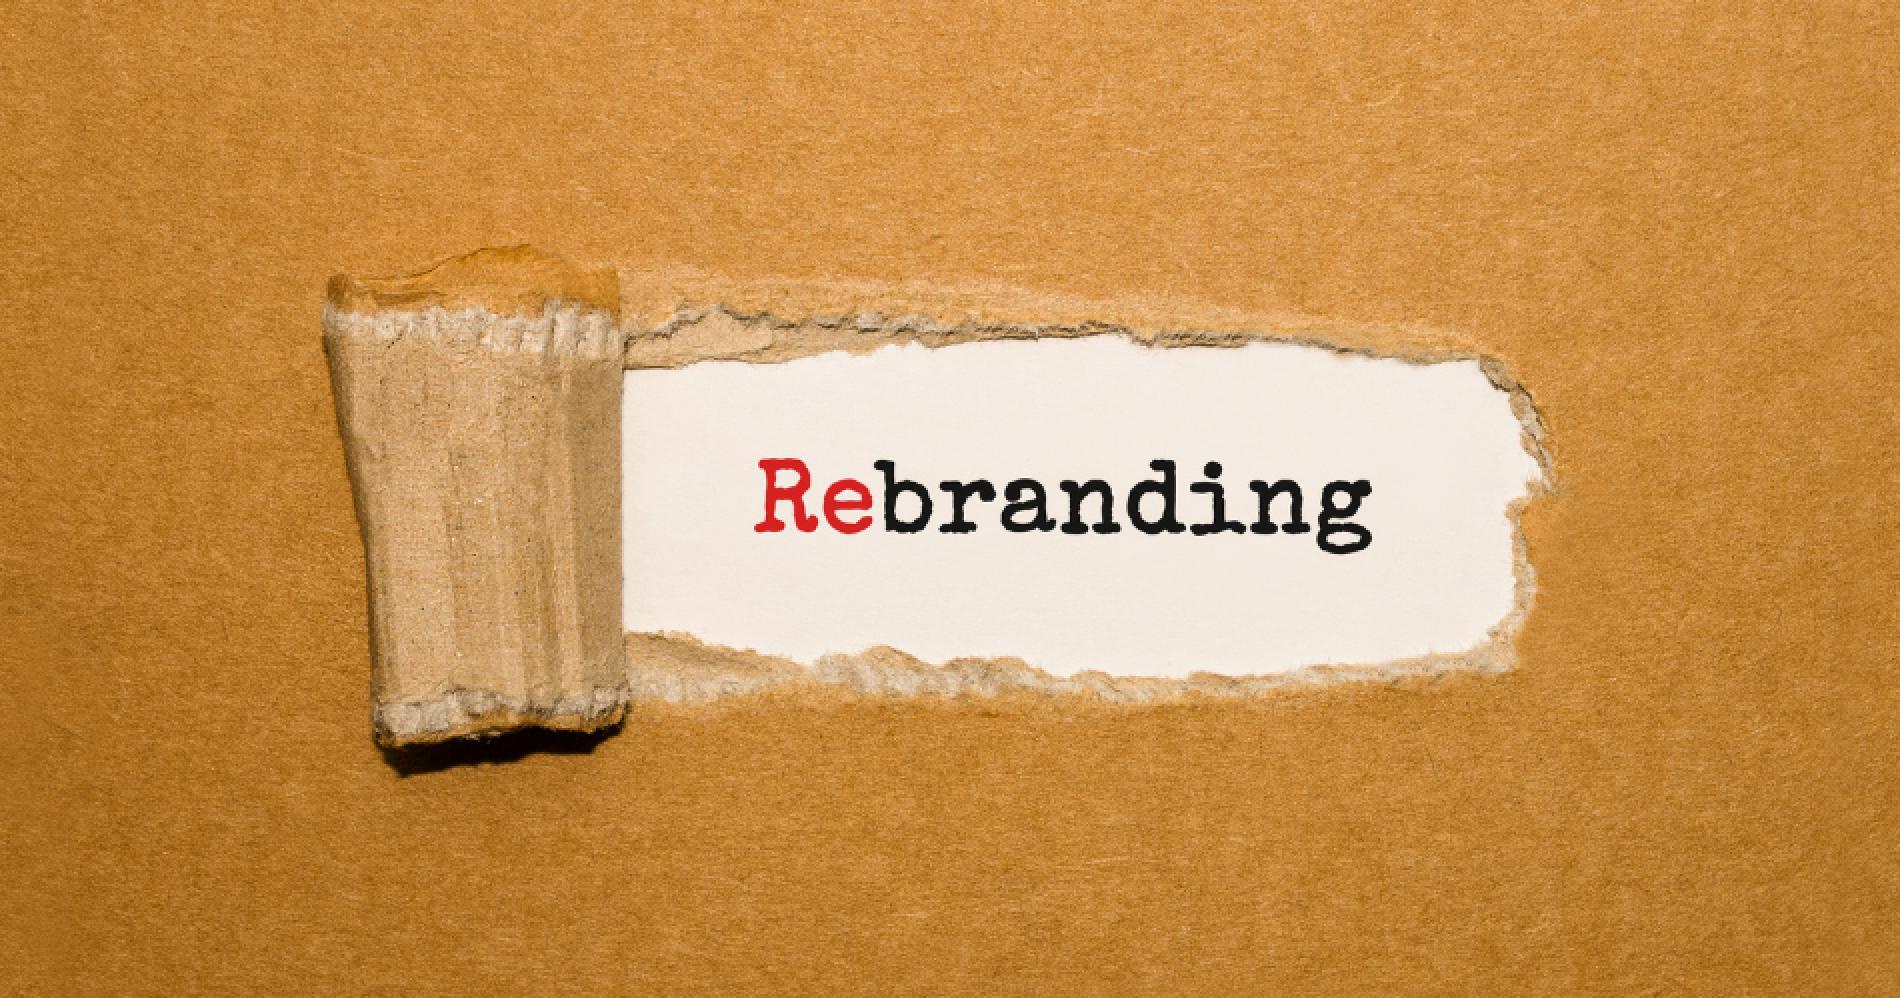 Rebranding Illustration Web Bisnis Muda - Canva